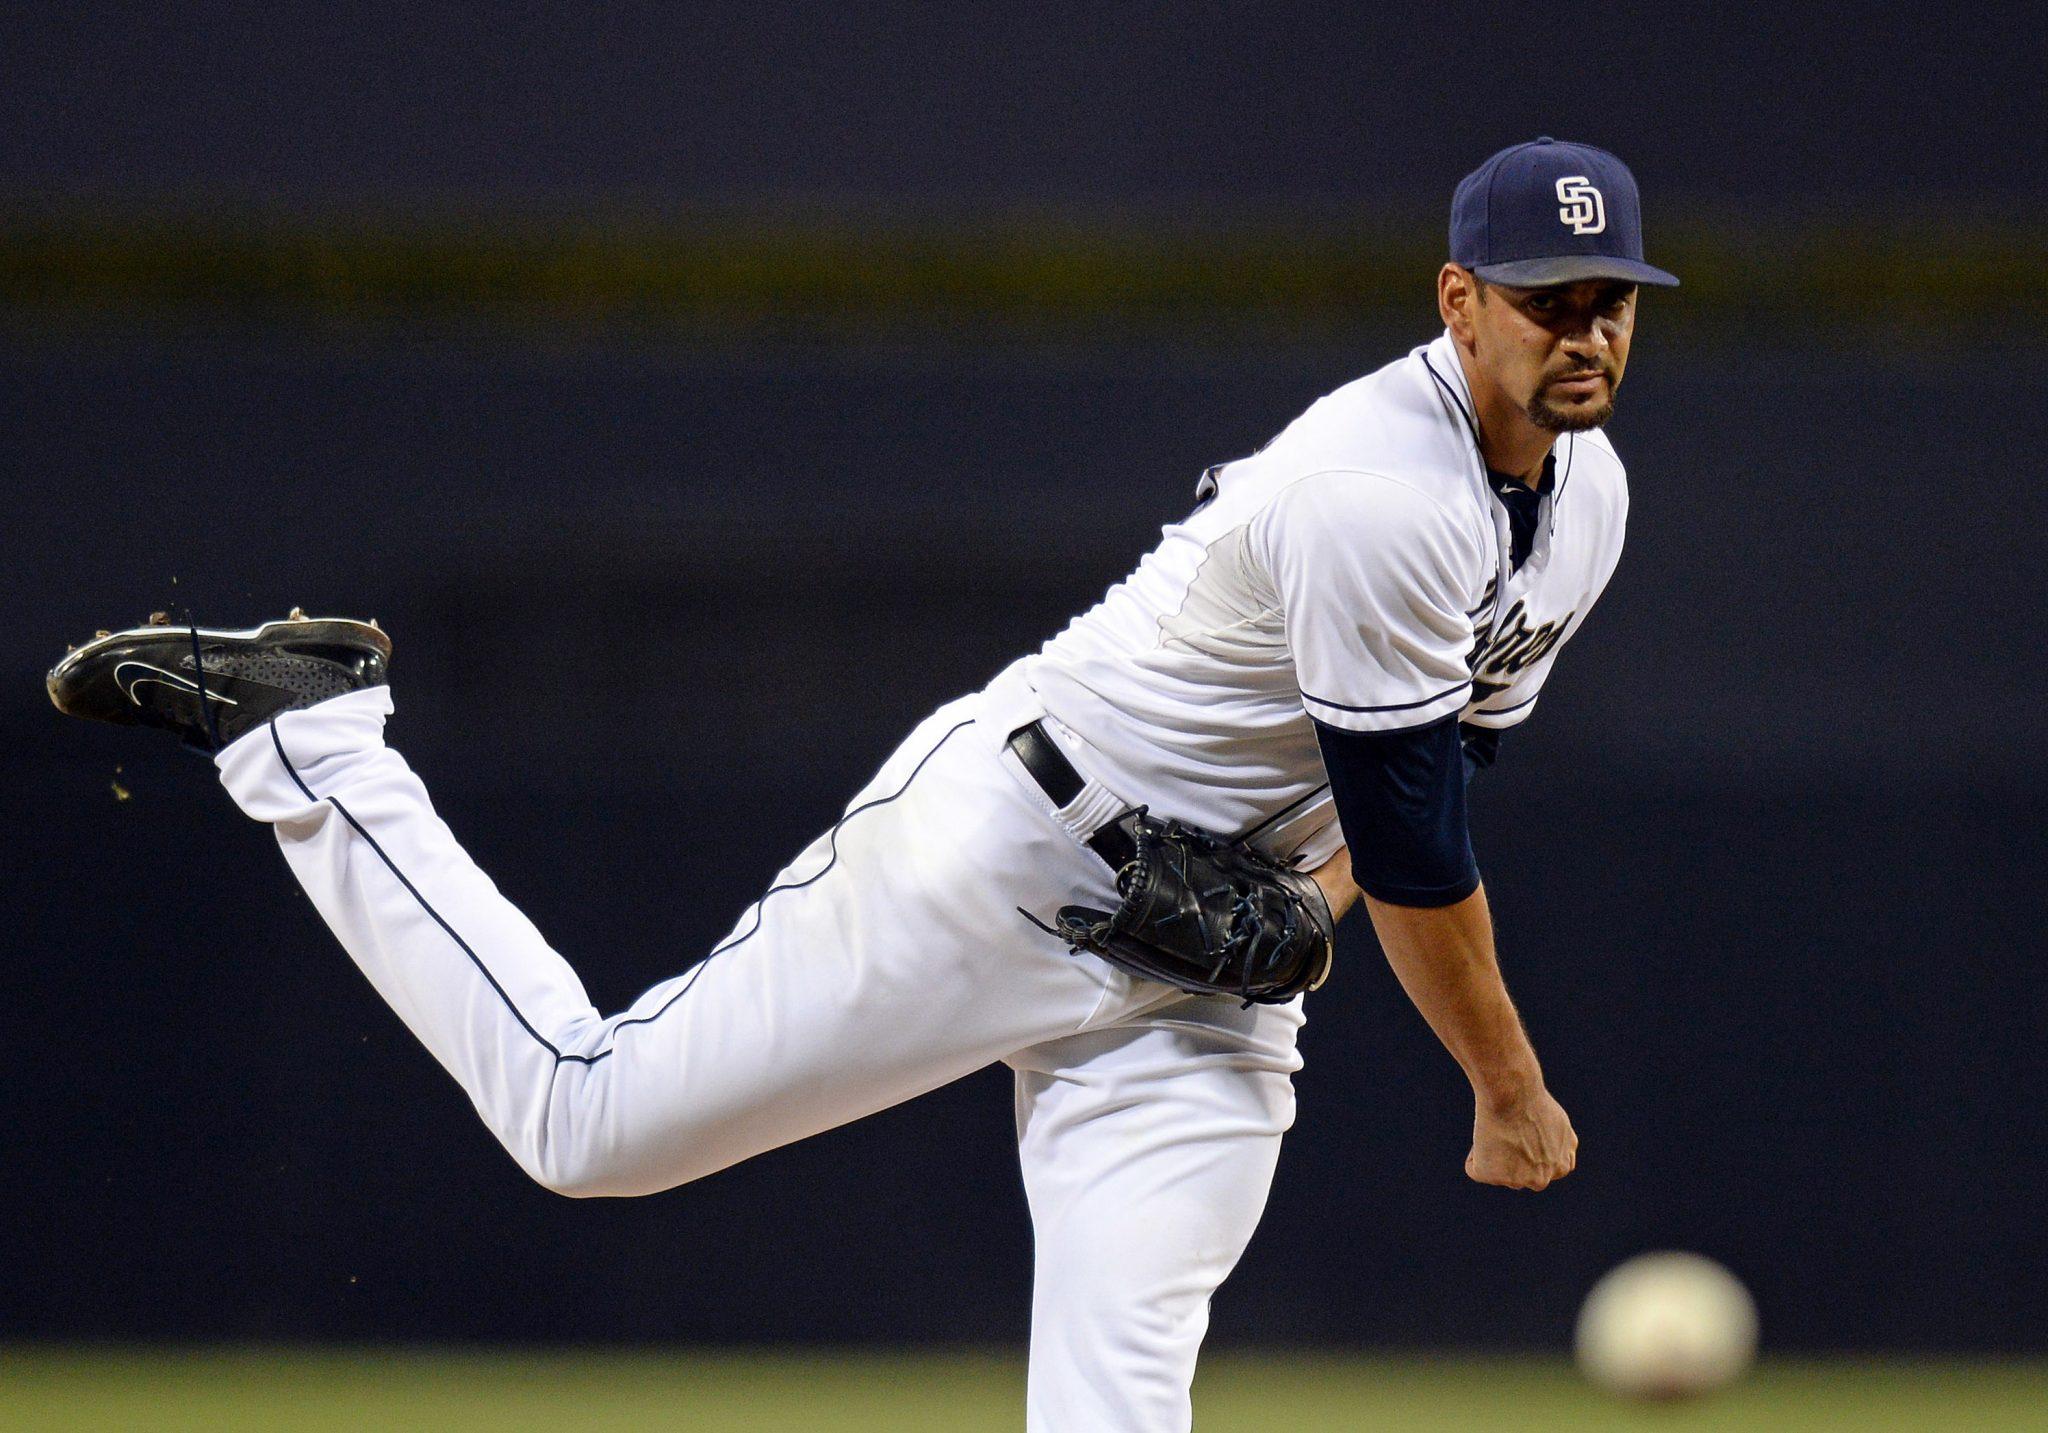 New York Yankees: Tyson Ross emerges as high risk, high reward option